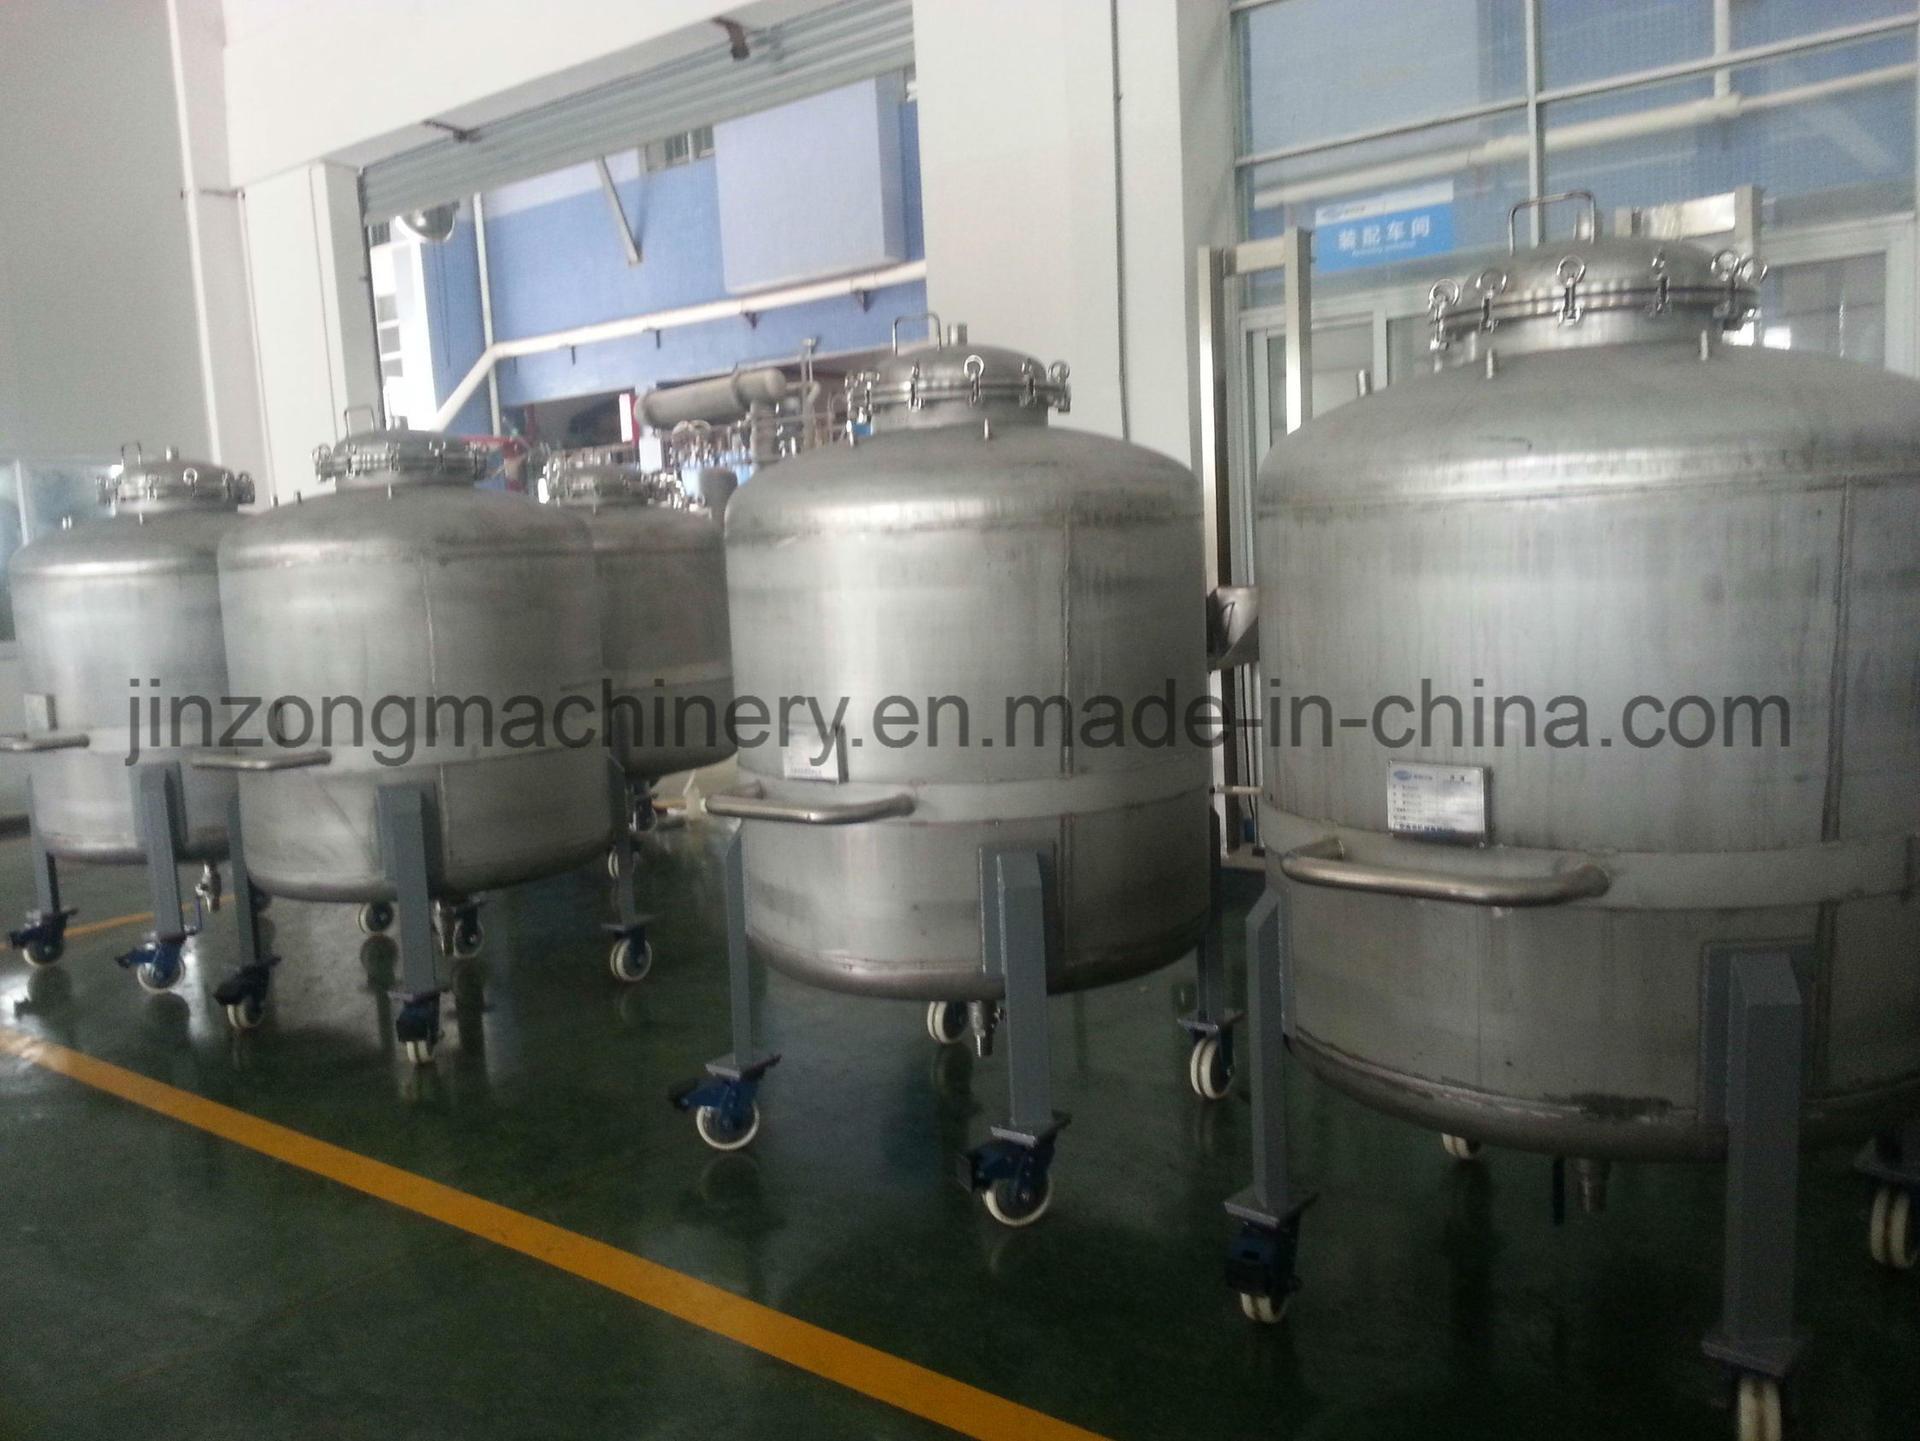 China Factory Price 304 316 Storage Tank